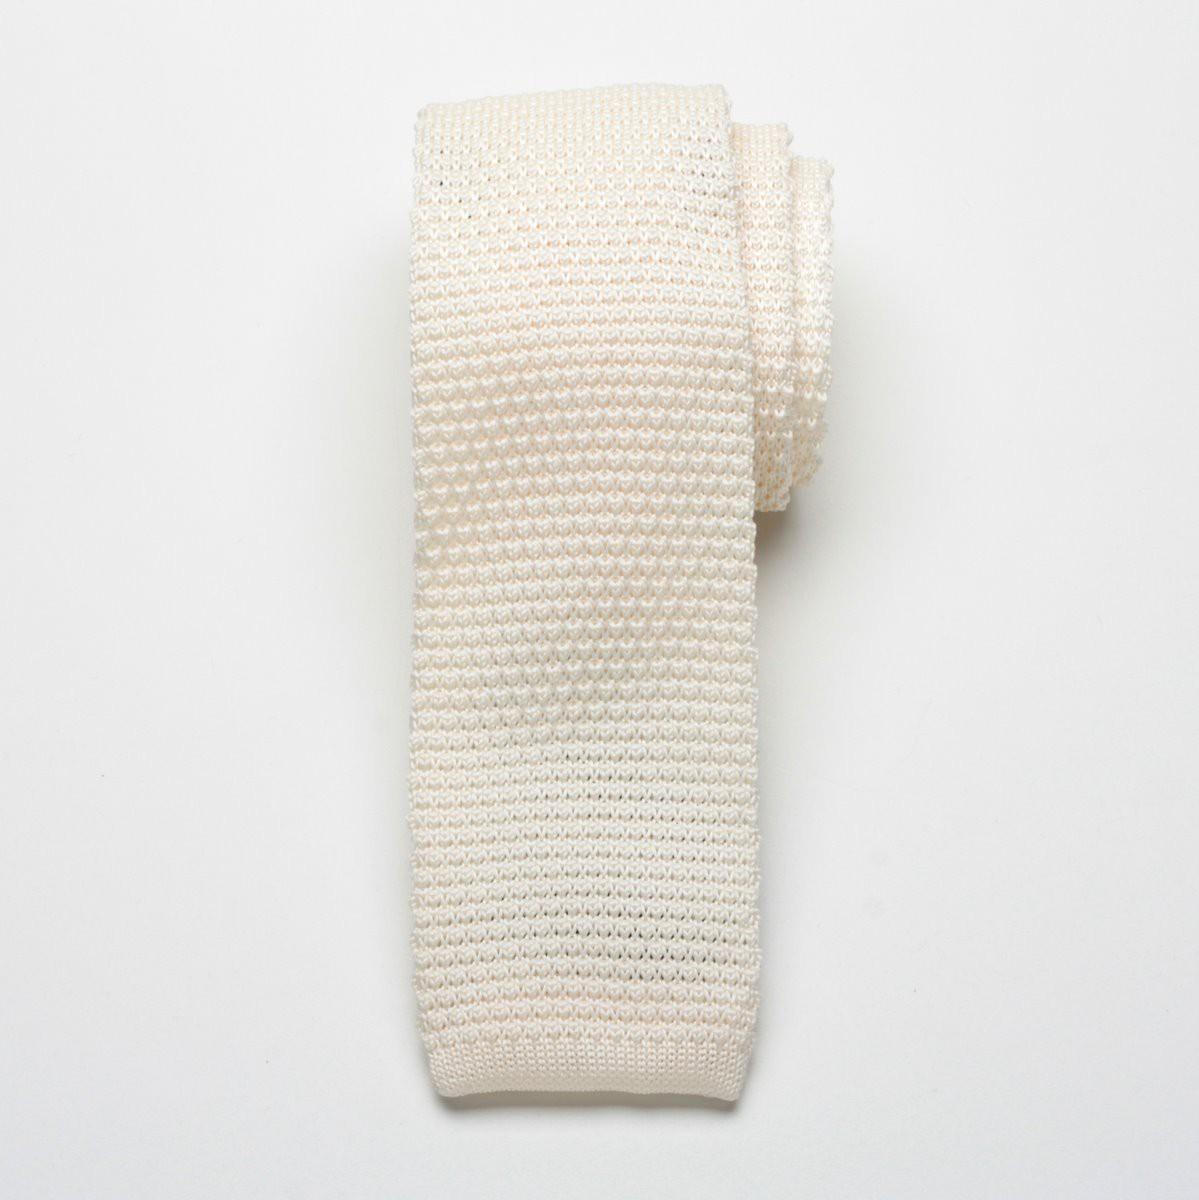 Krawat tkany Willsoor - kremowy